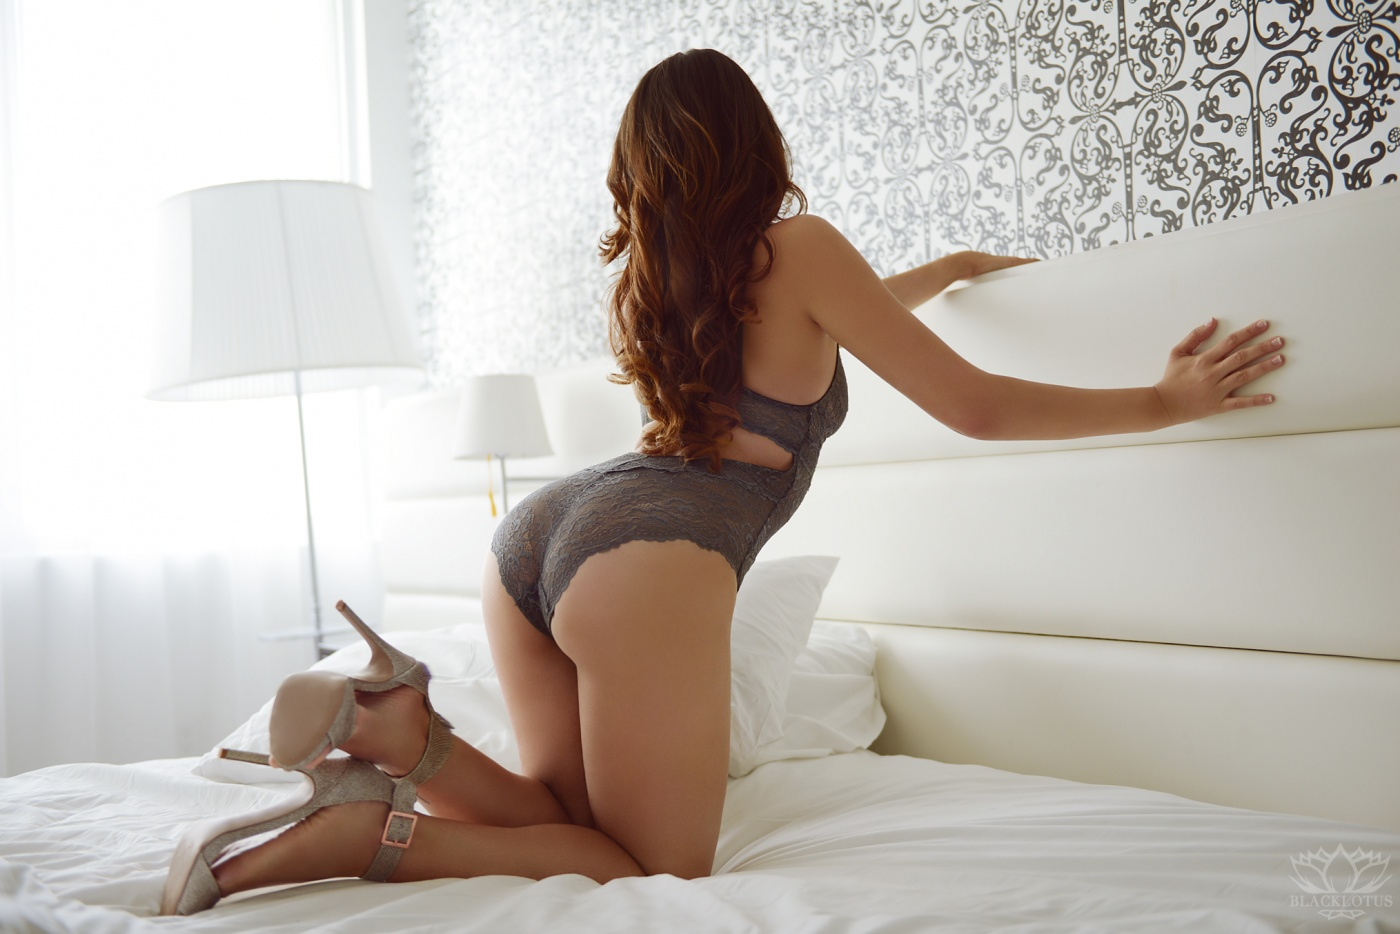 Dina Lenore